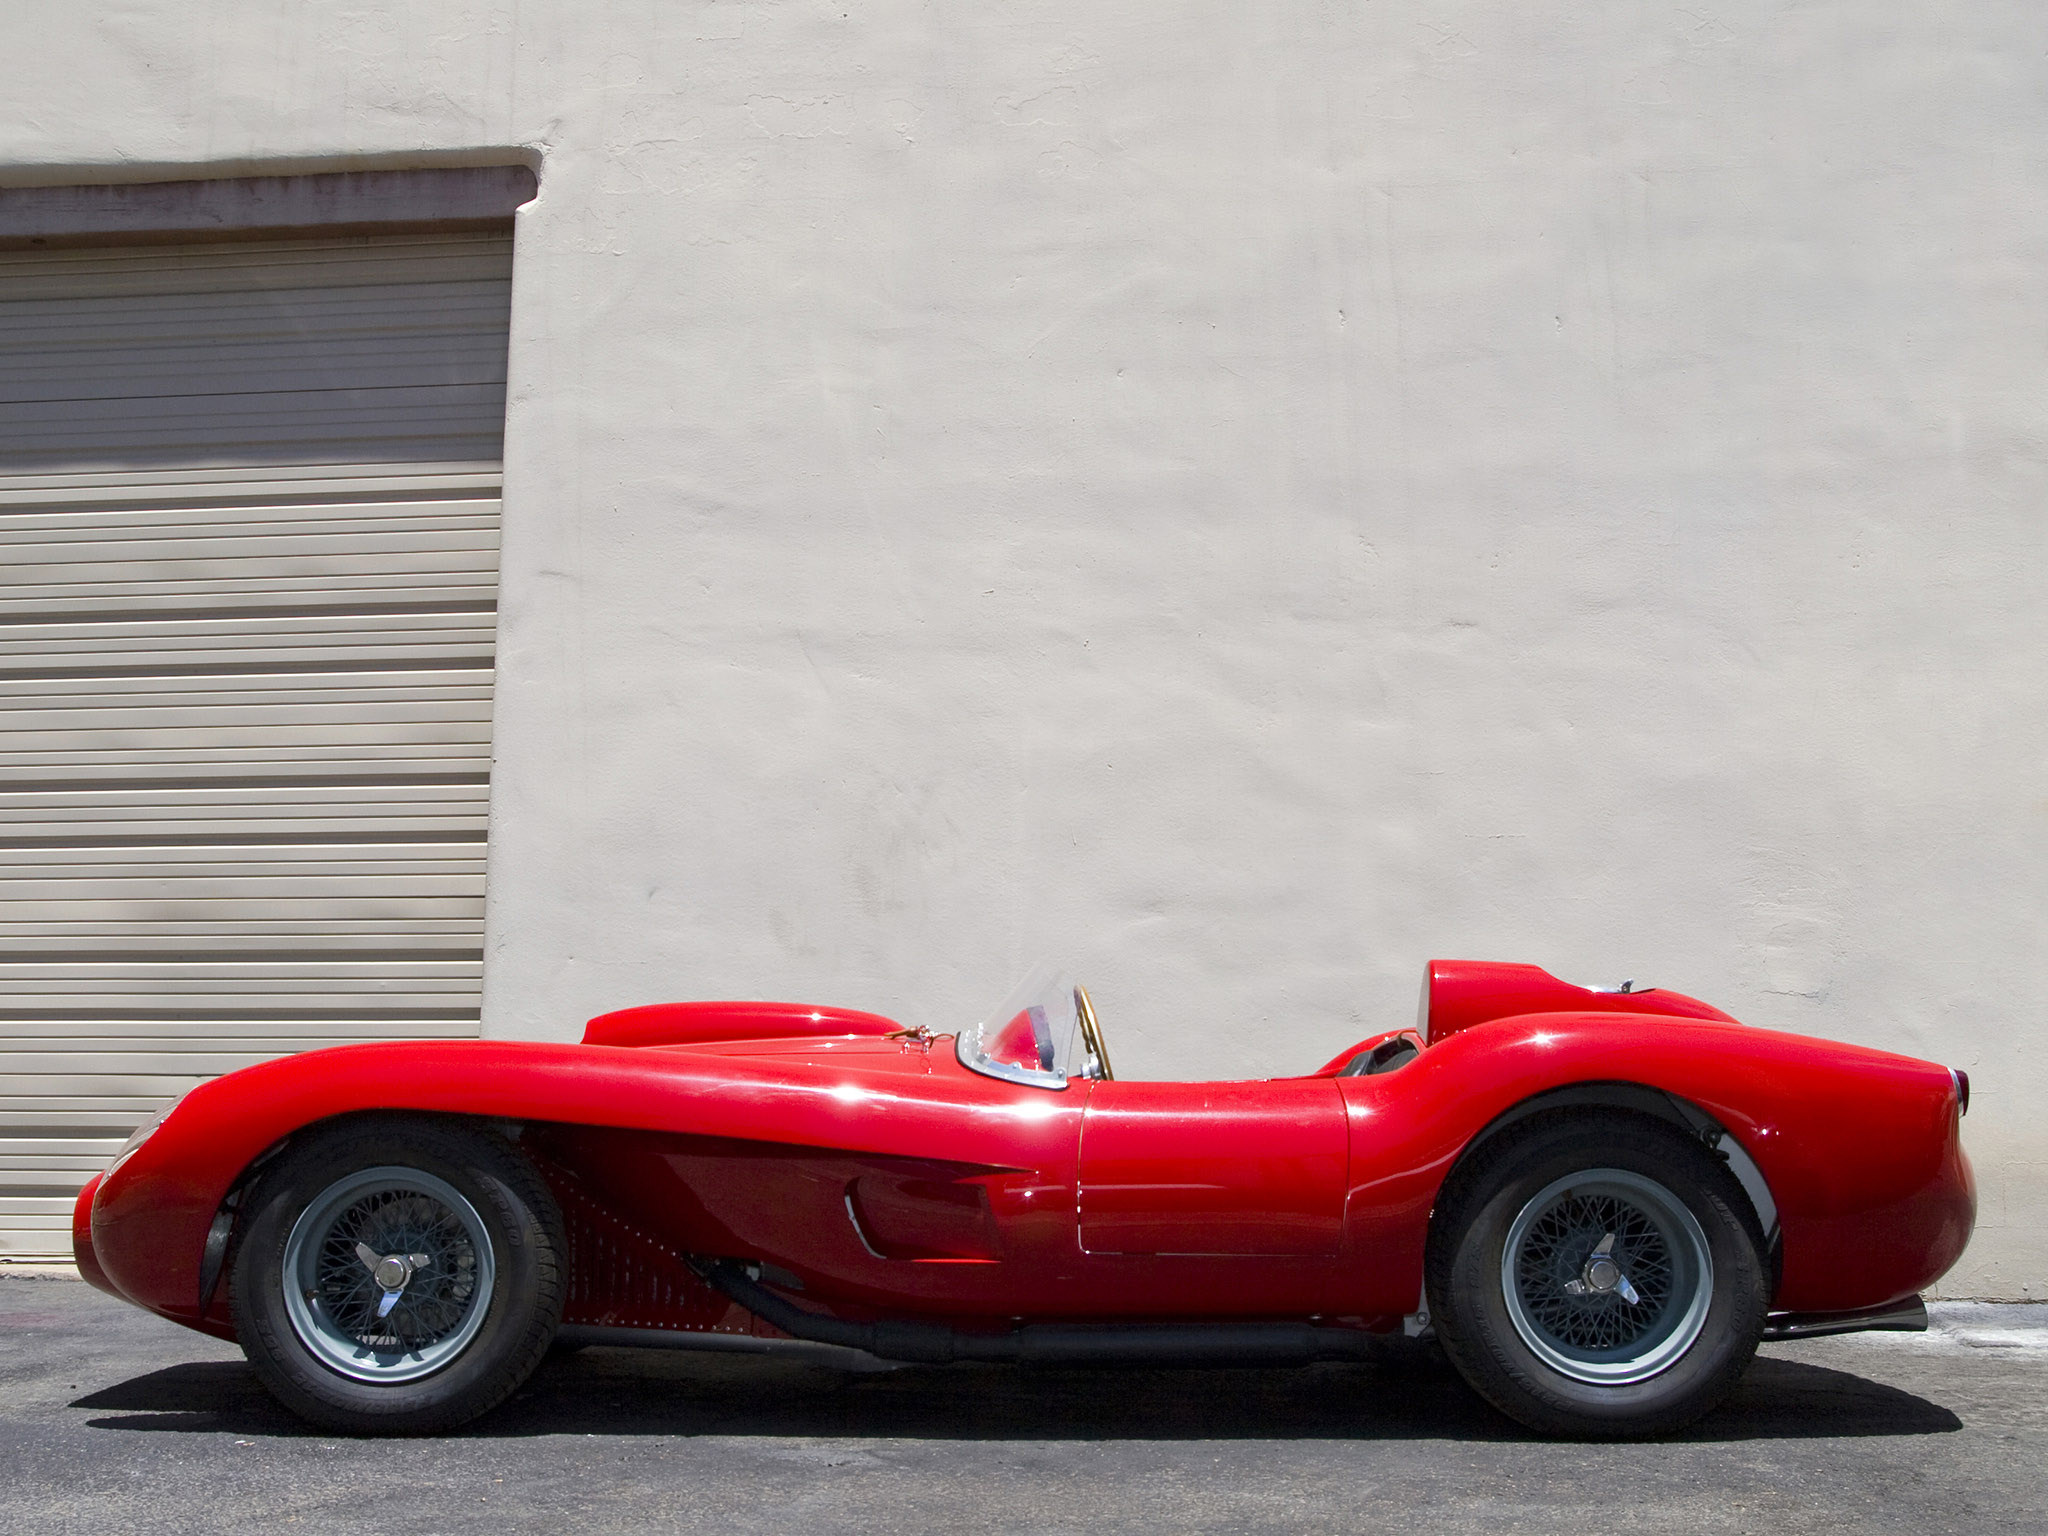 Ferrari 250 Testa Rossa Recreation By Tempero Sn 6301 1965